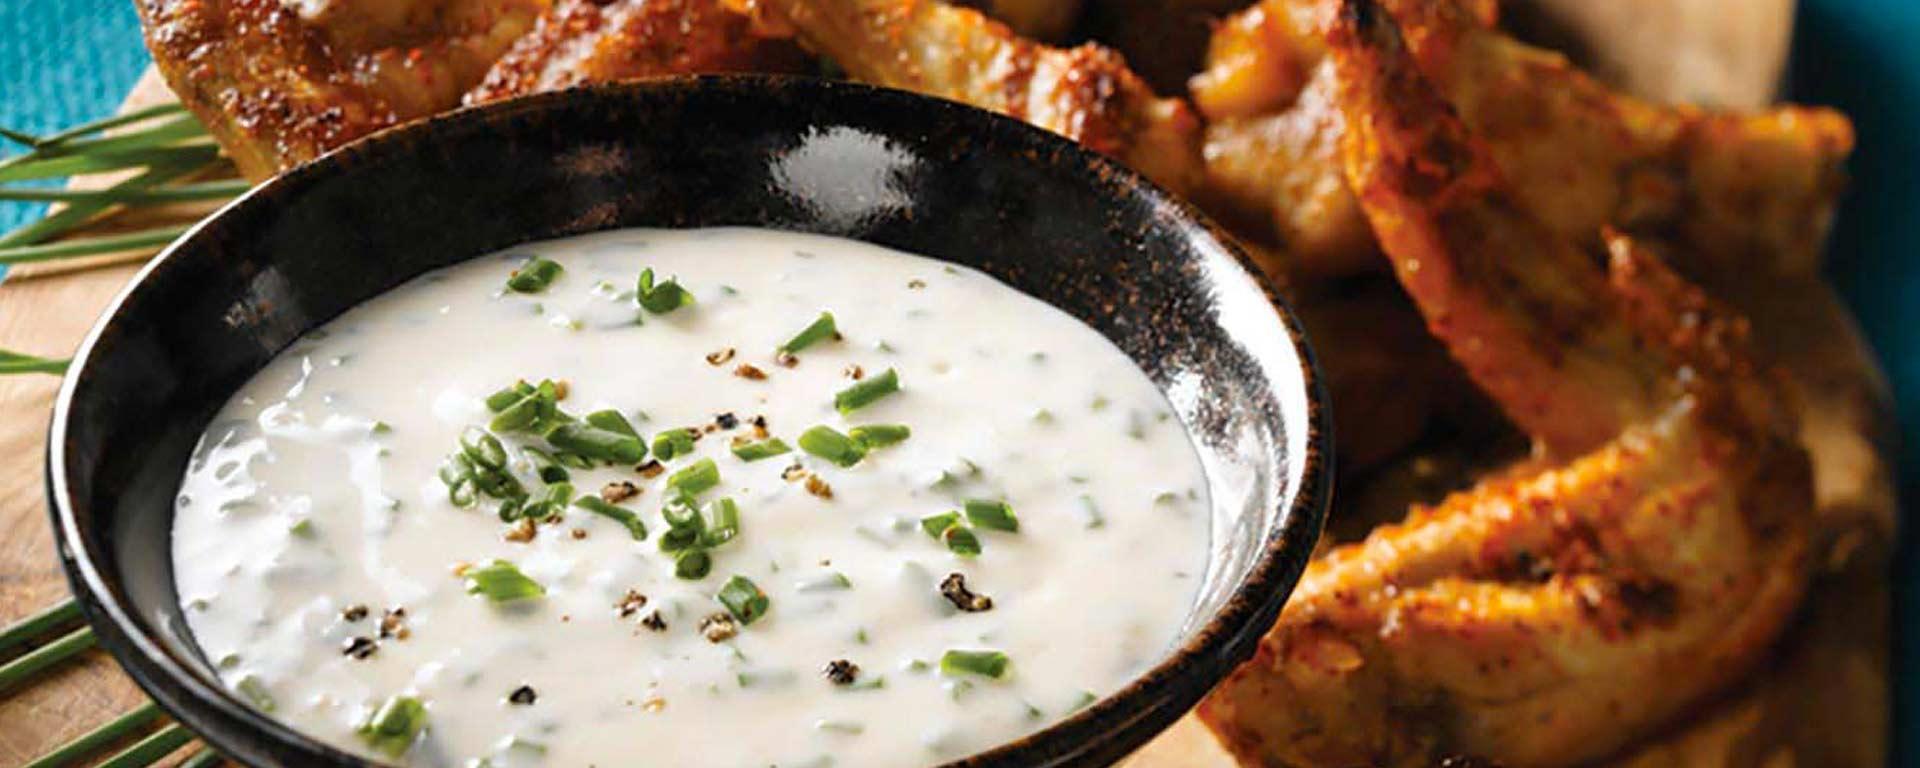 Photo for - Sour Cream Dip – Maple Chive Sour Cream